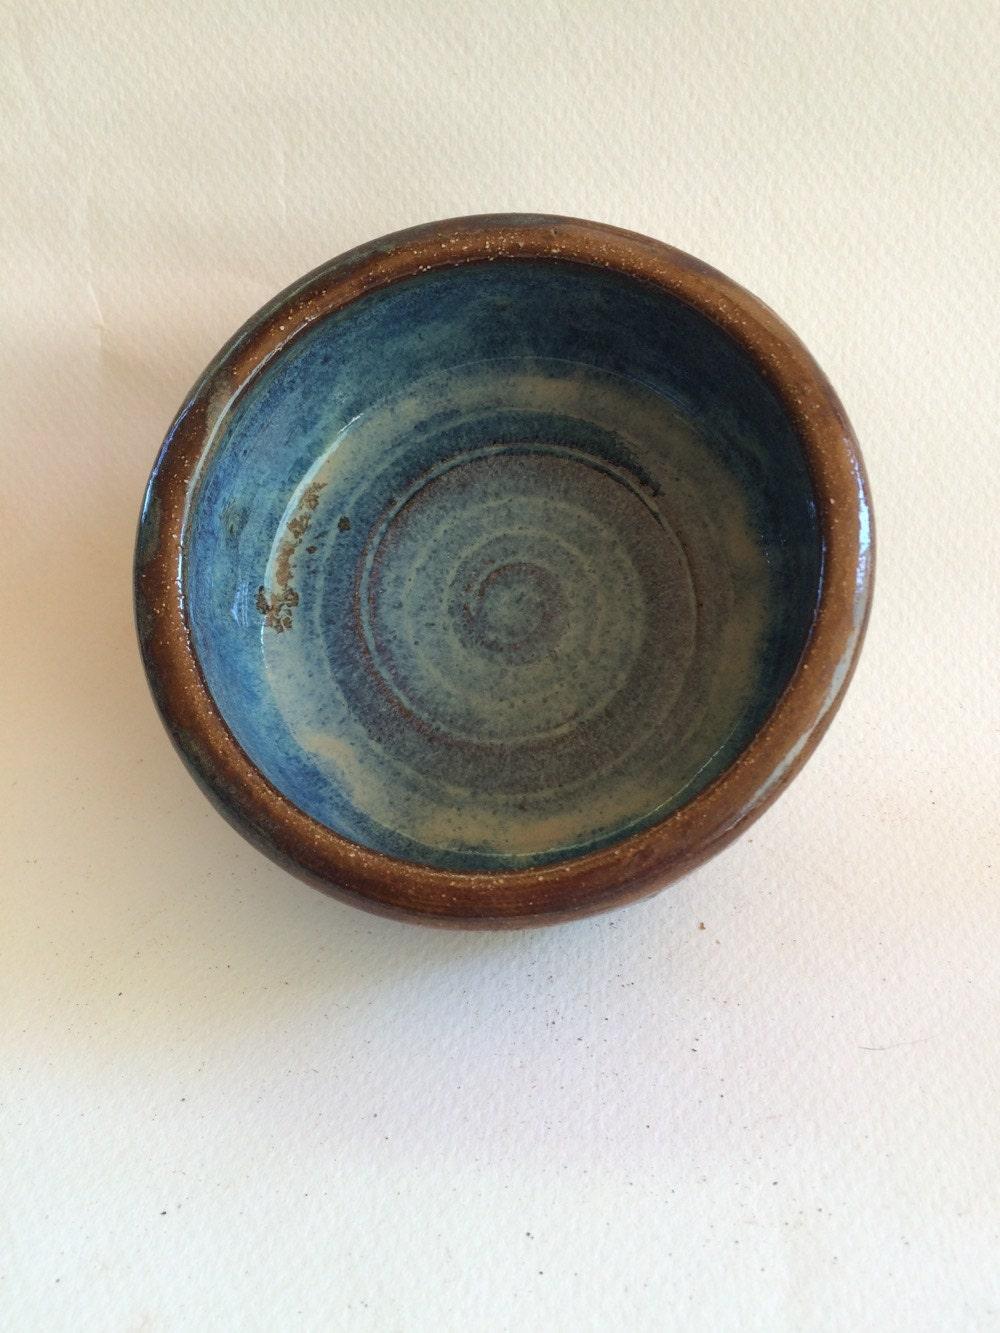 Handmade Stoneware Ceramic Pottery Bowl Great For Everyday